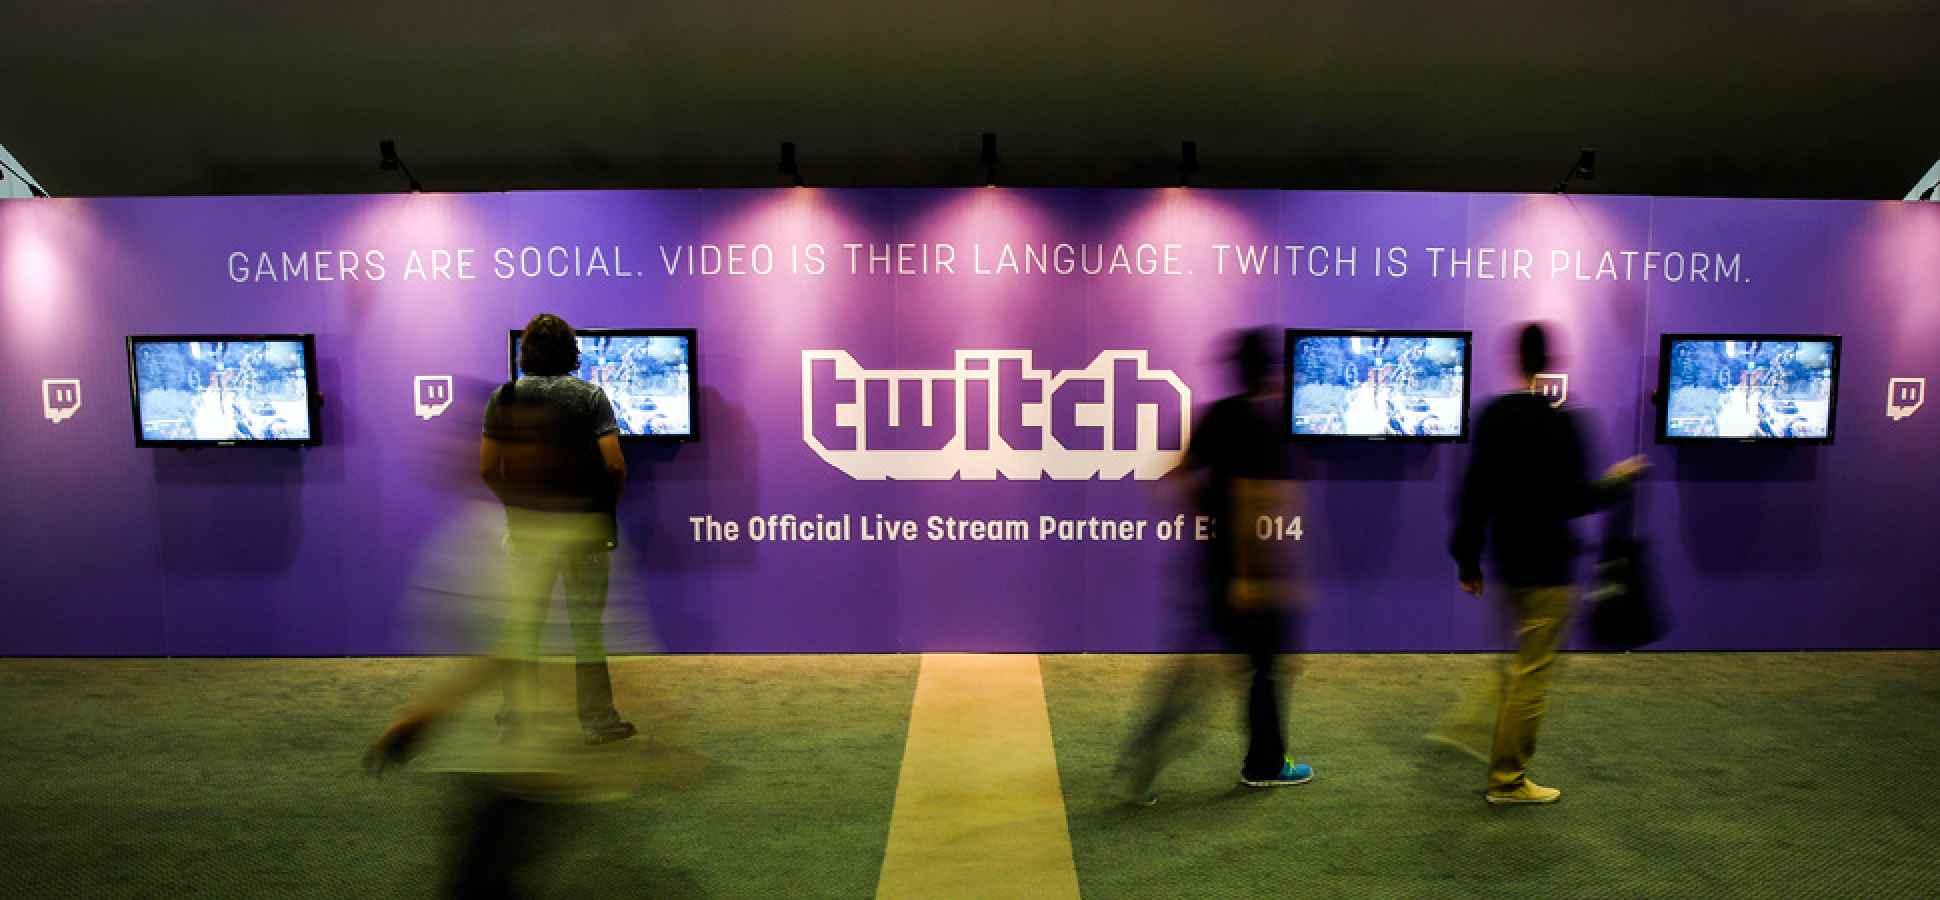 4 Takeaways from Amazon's Billion Dollar Deal for Twitch